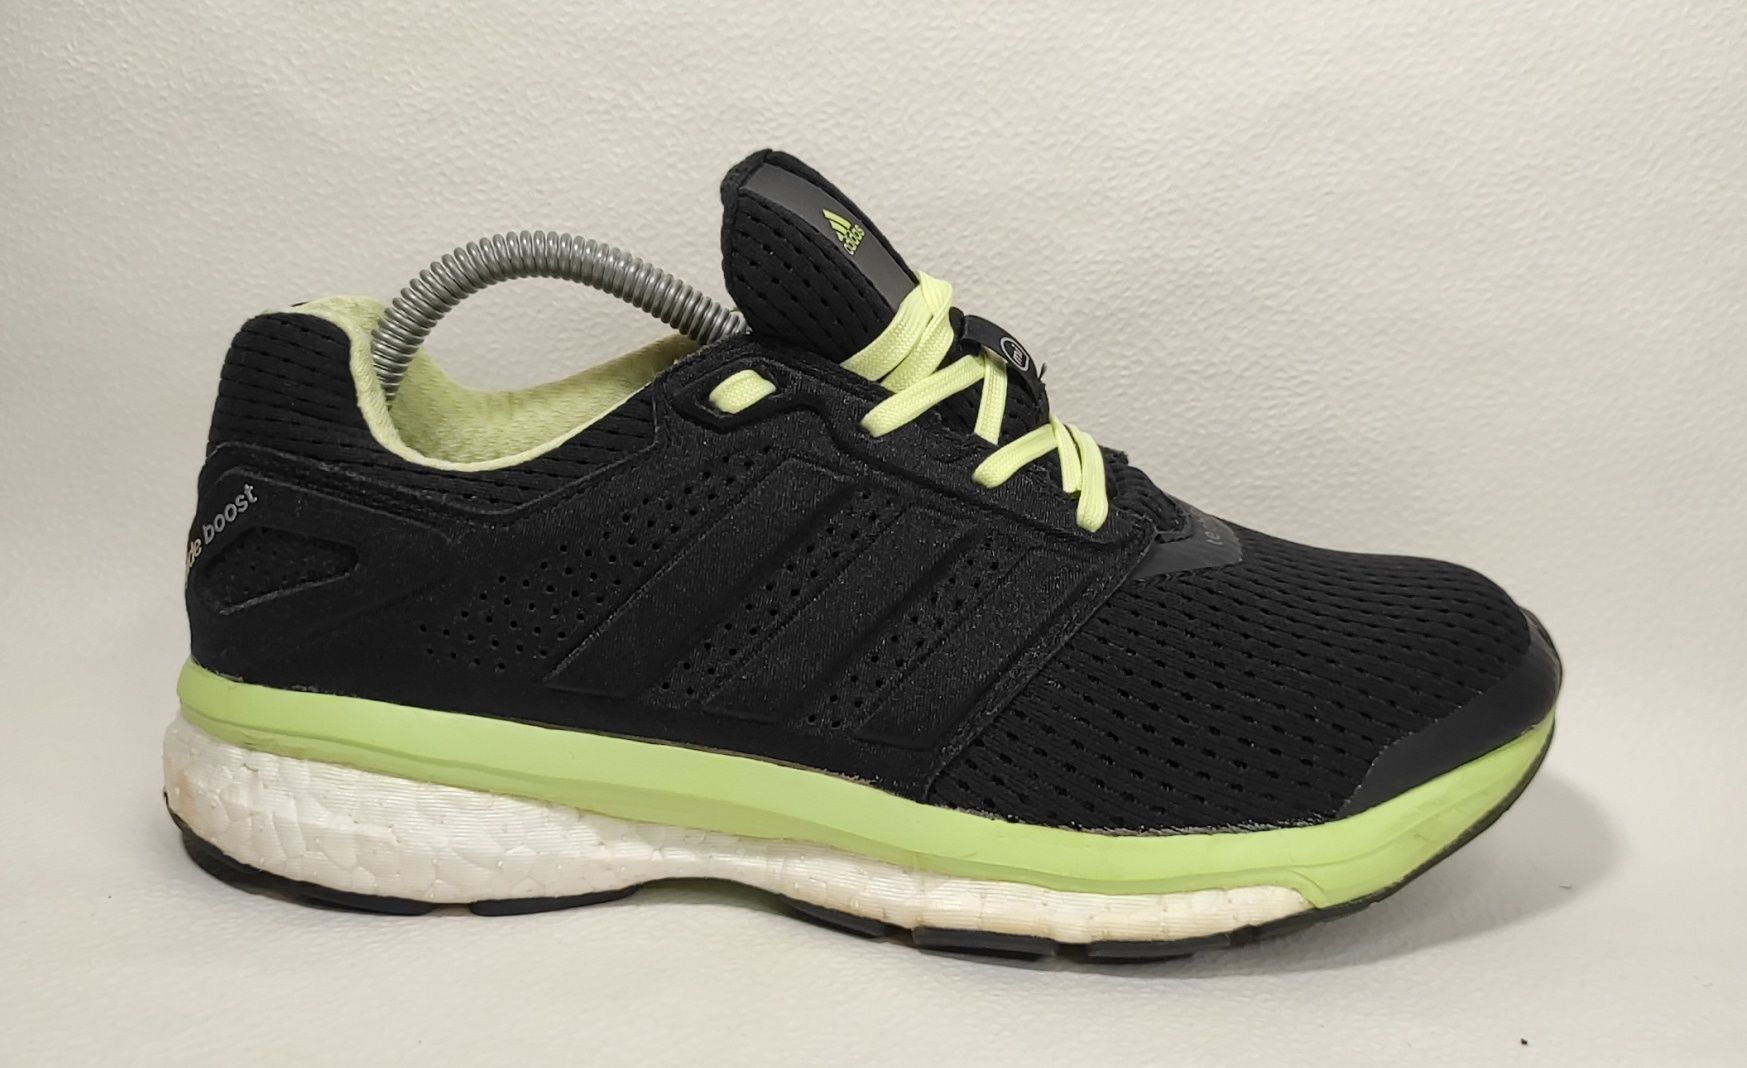 Adidas Endless Boost Run оригинал в хорошем состоянии